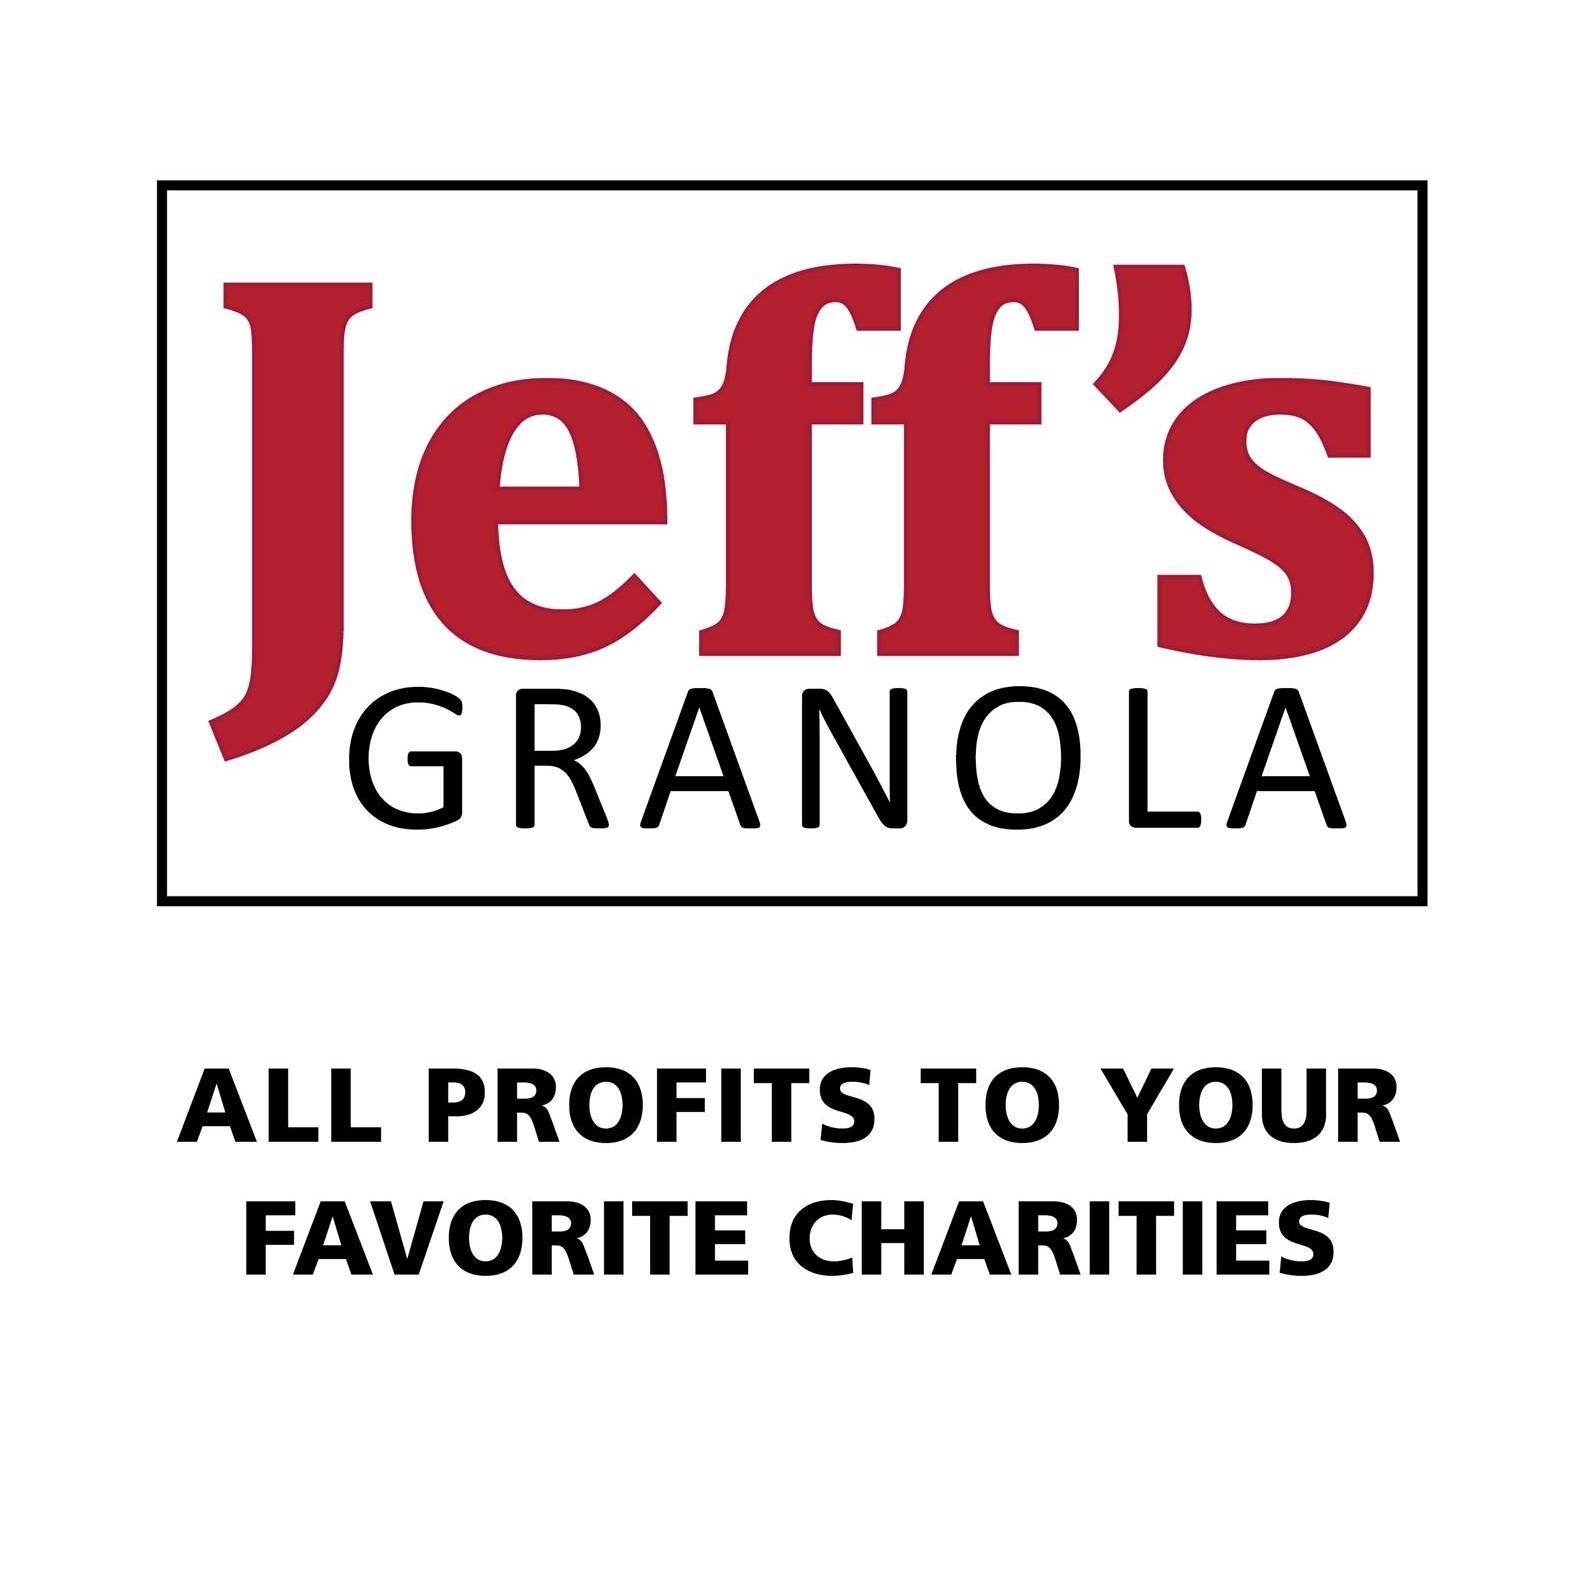 Jeff's Granola